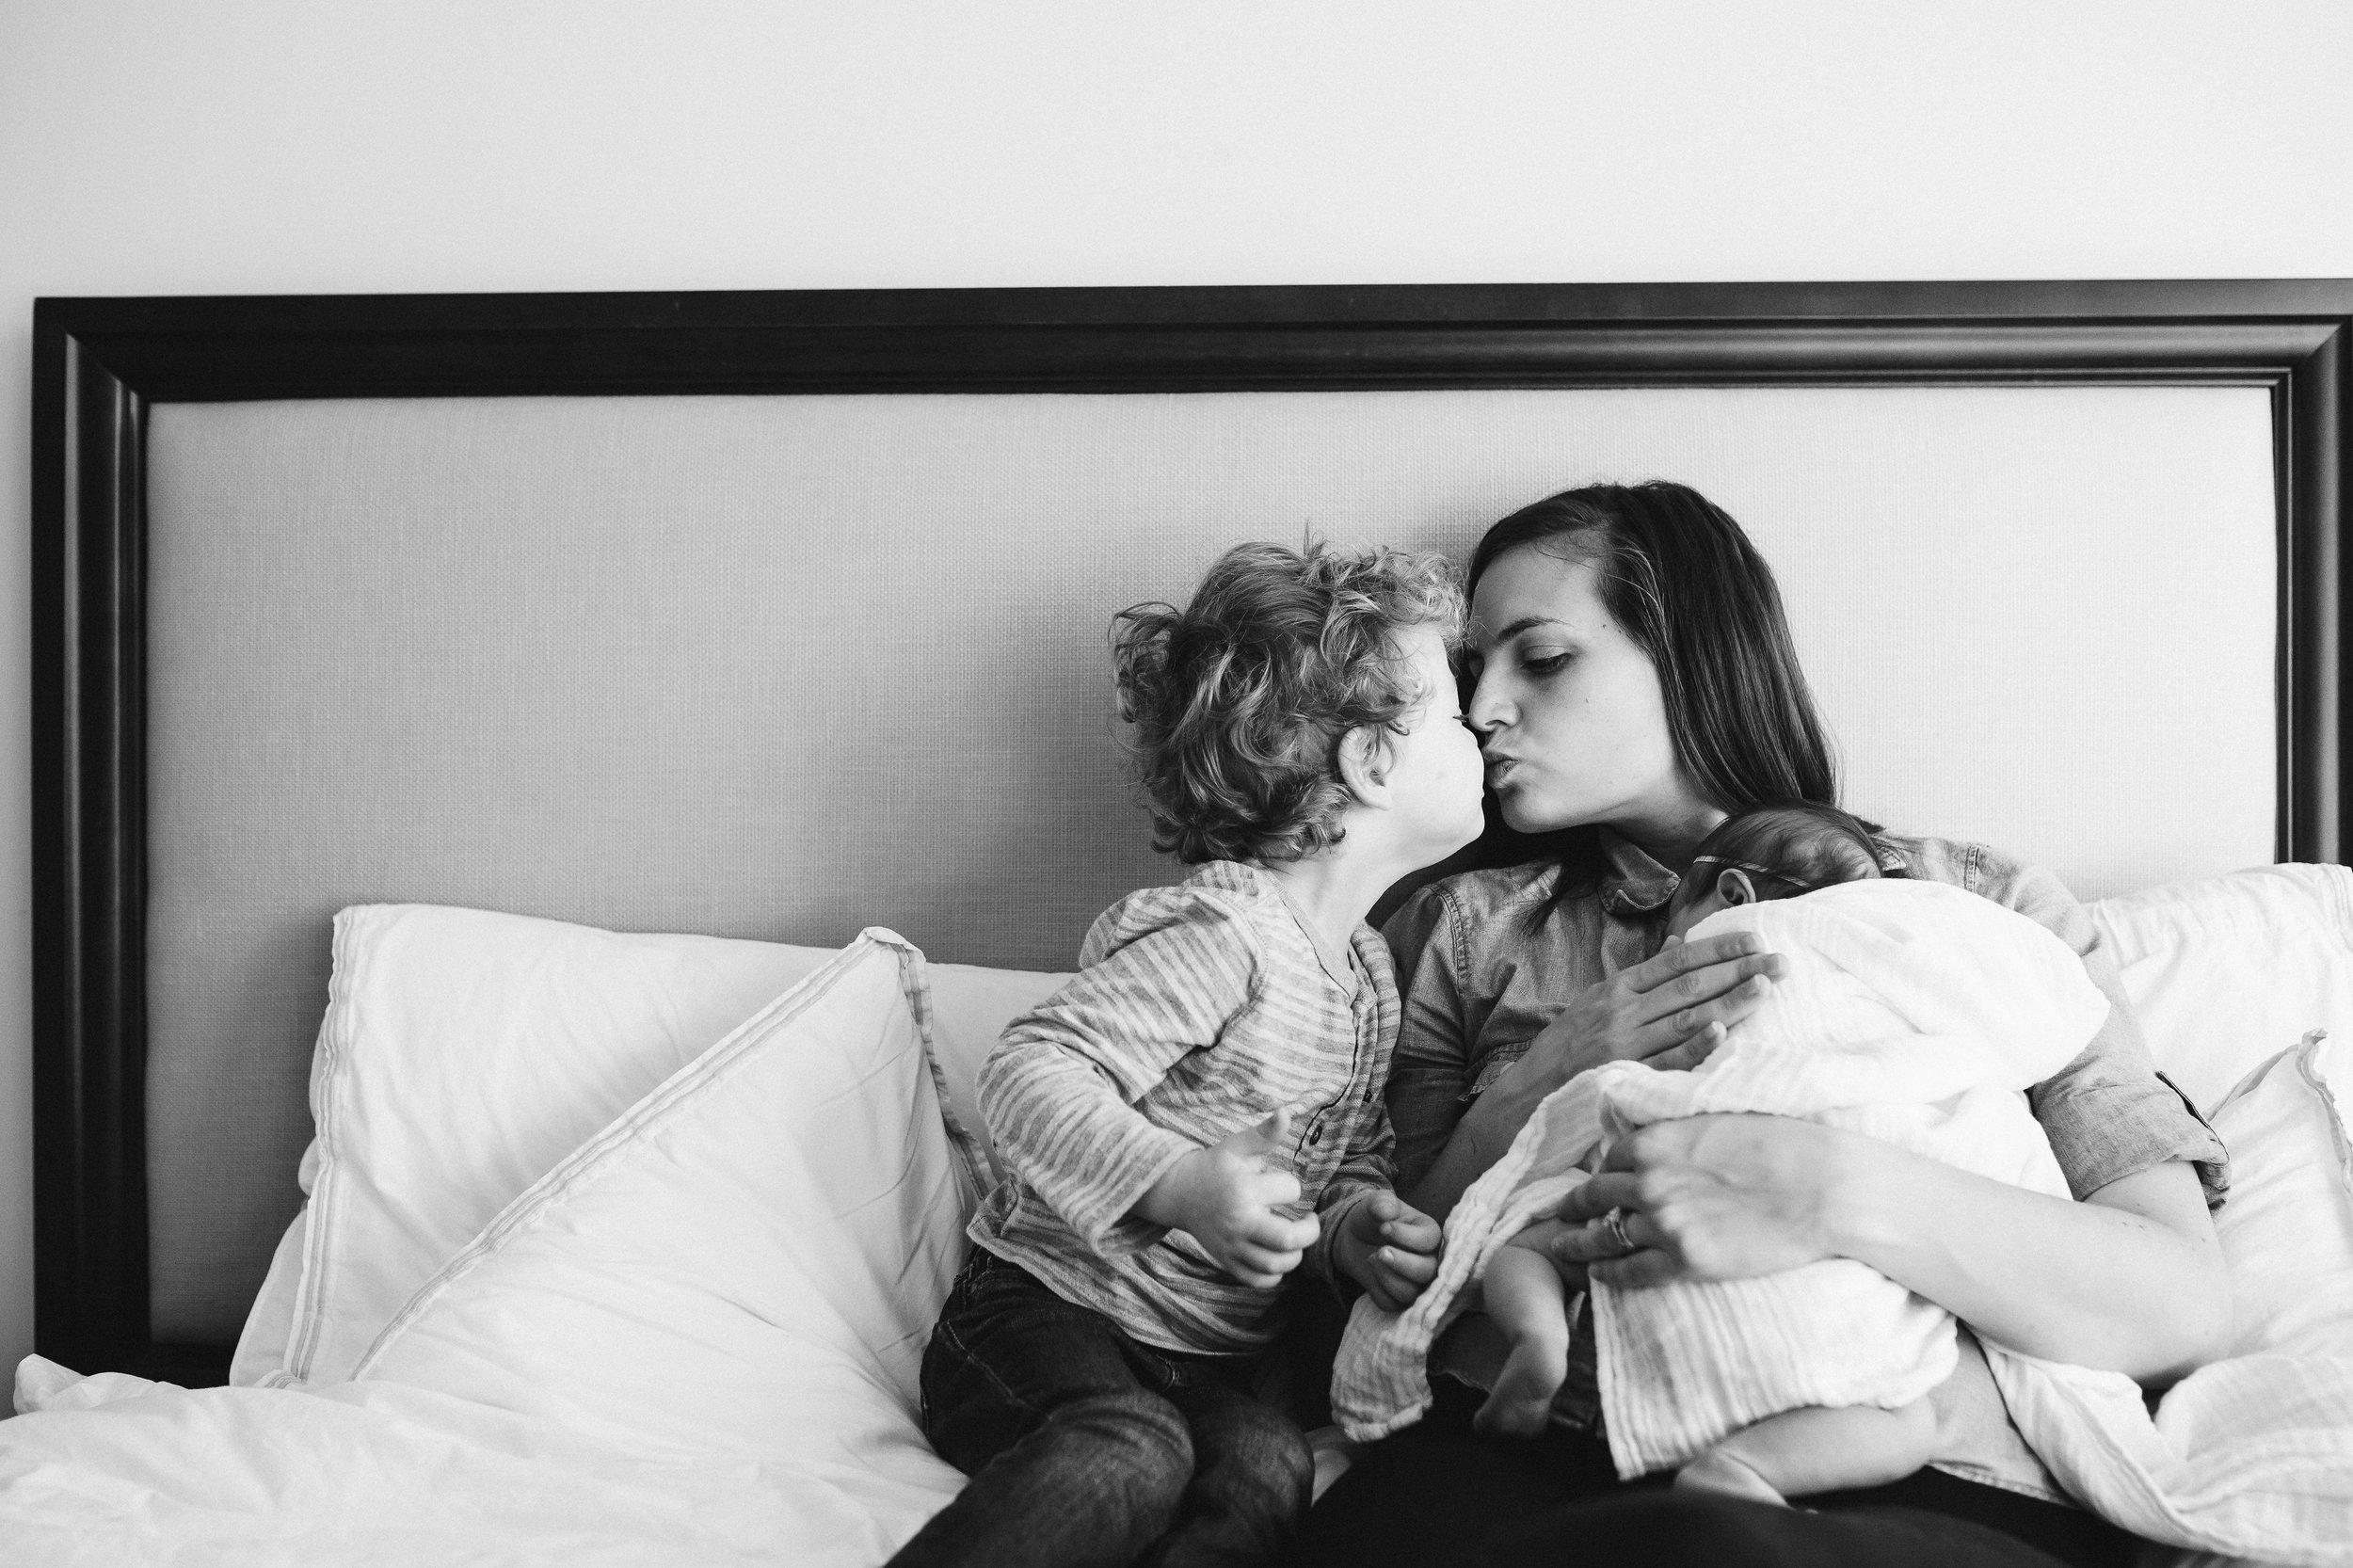 verbuch-family_brooklyn-ny-newborn-photography-44.jpg